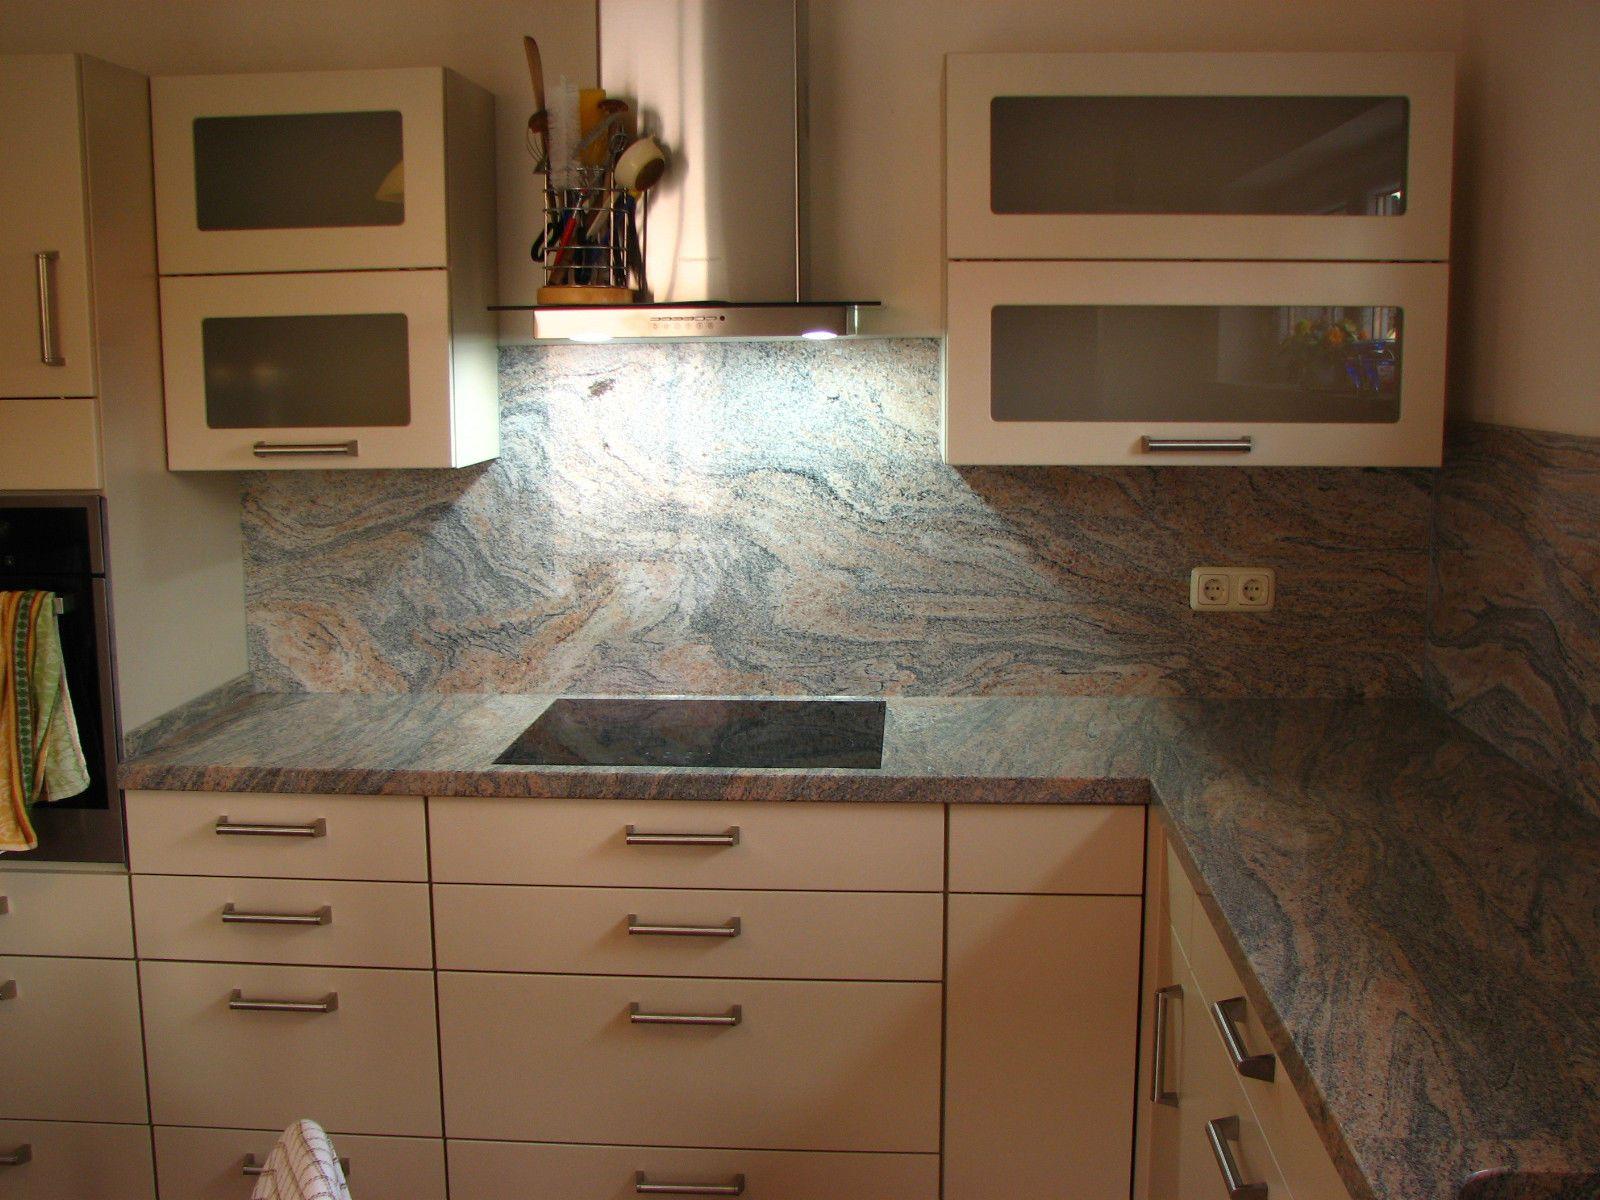 k chenarbeitsplatte platte arbeitsplatte k cheninsel k che juparana india granit wohnen. Black Bedroom Furniture Sets. Home Design Ideas